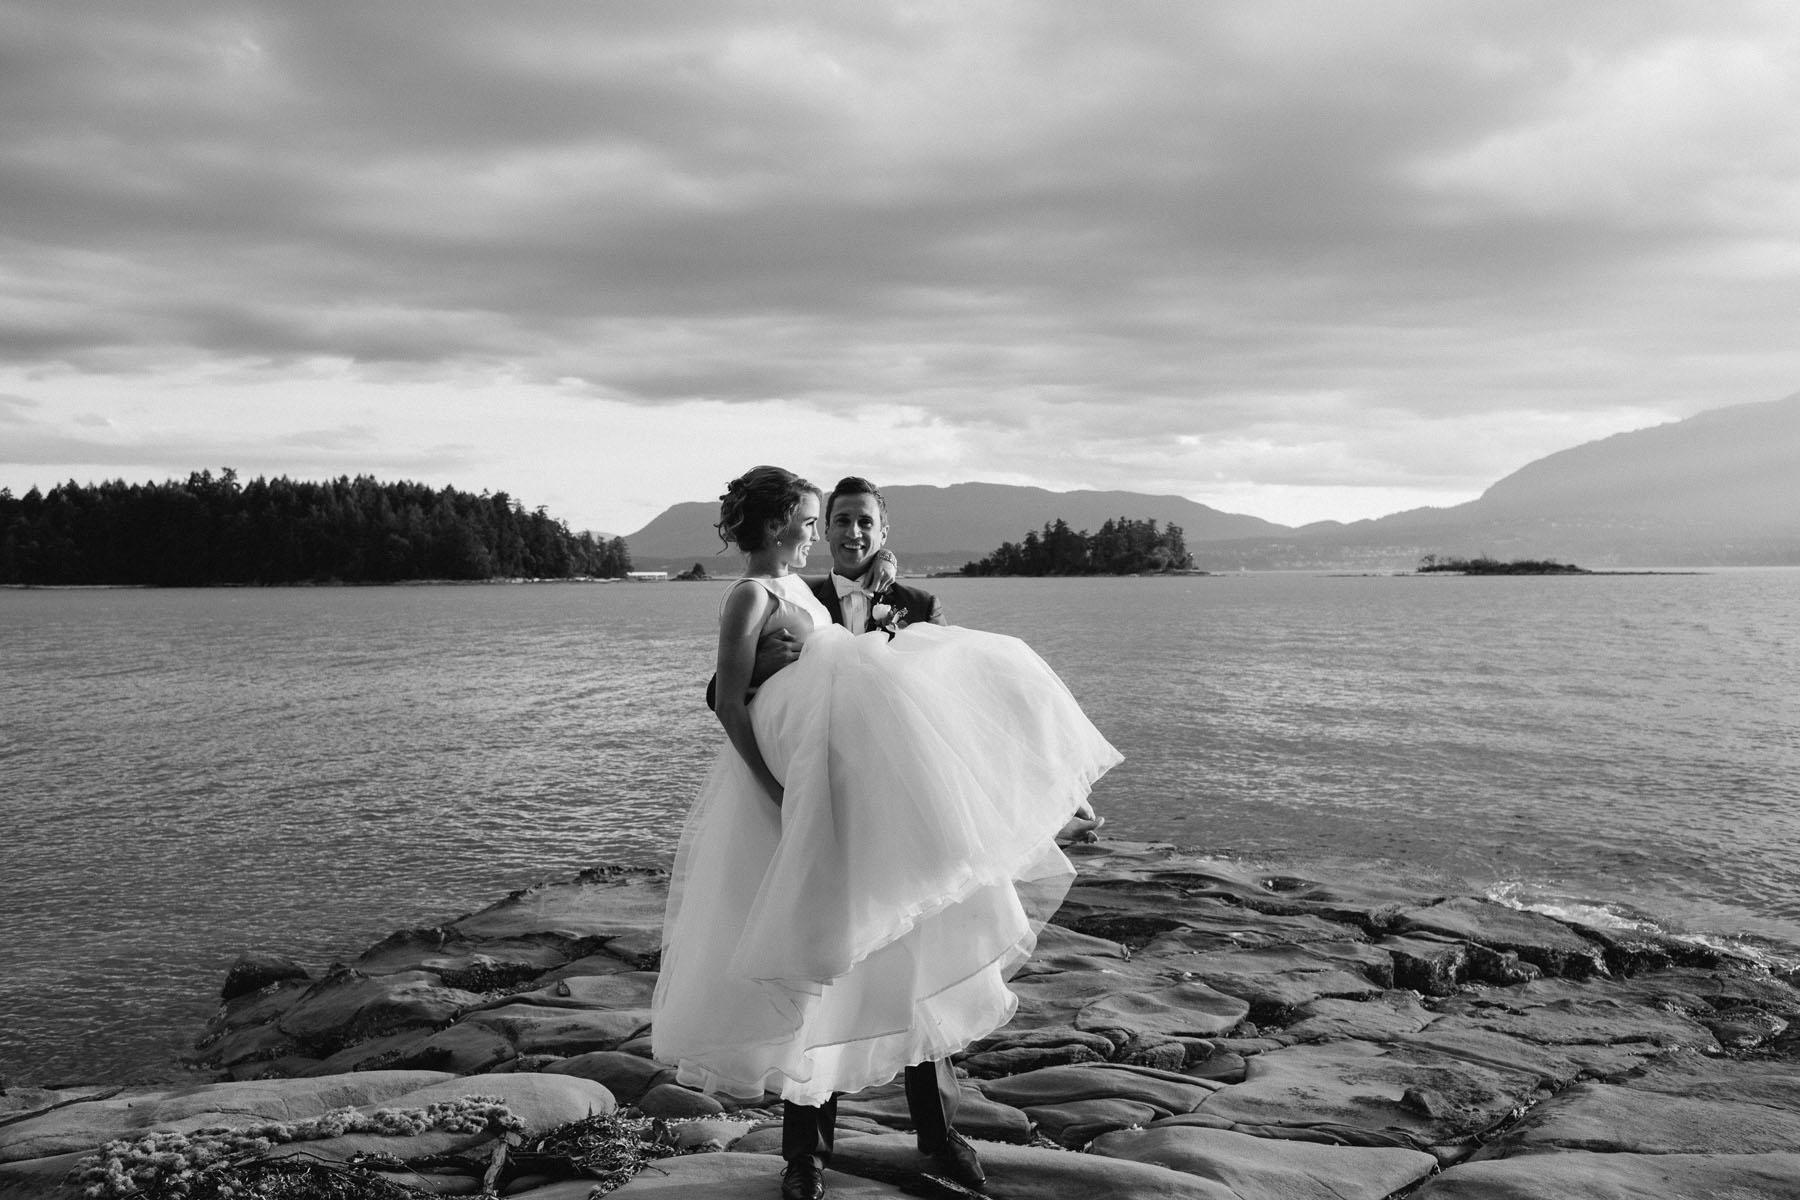 thetis-island-wedding-photographer-rp-rn-142.jpg